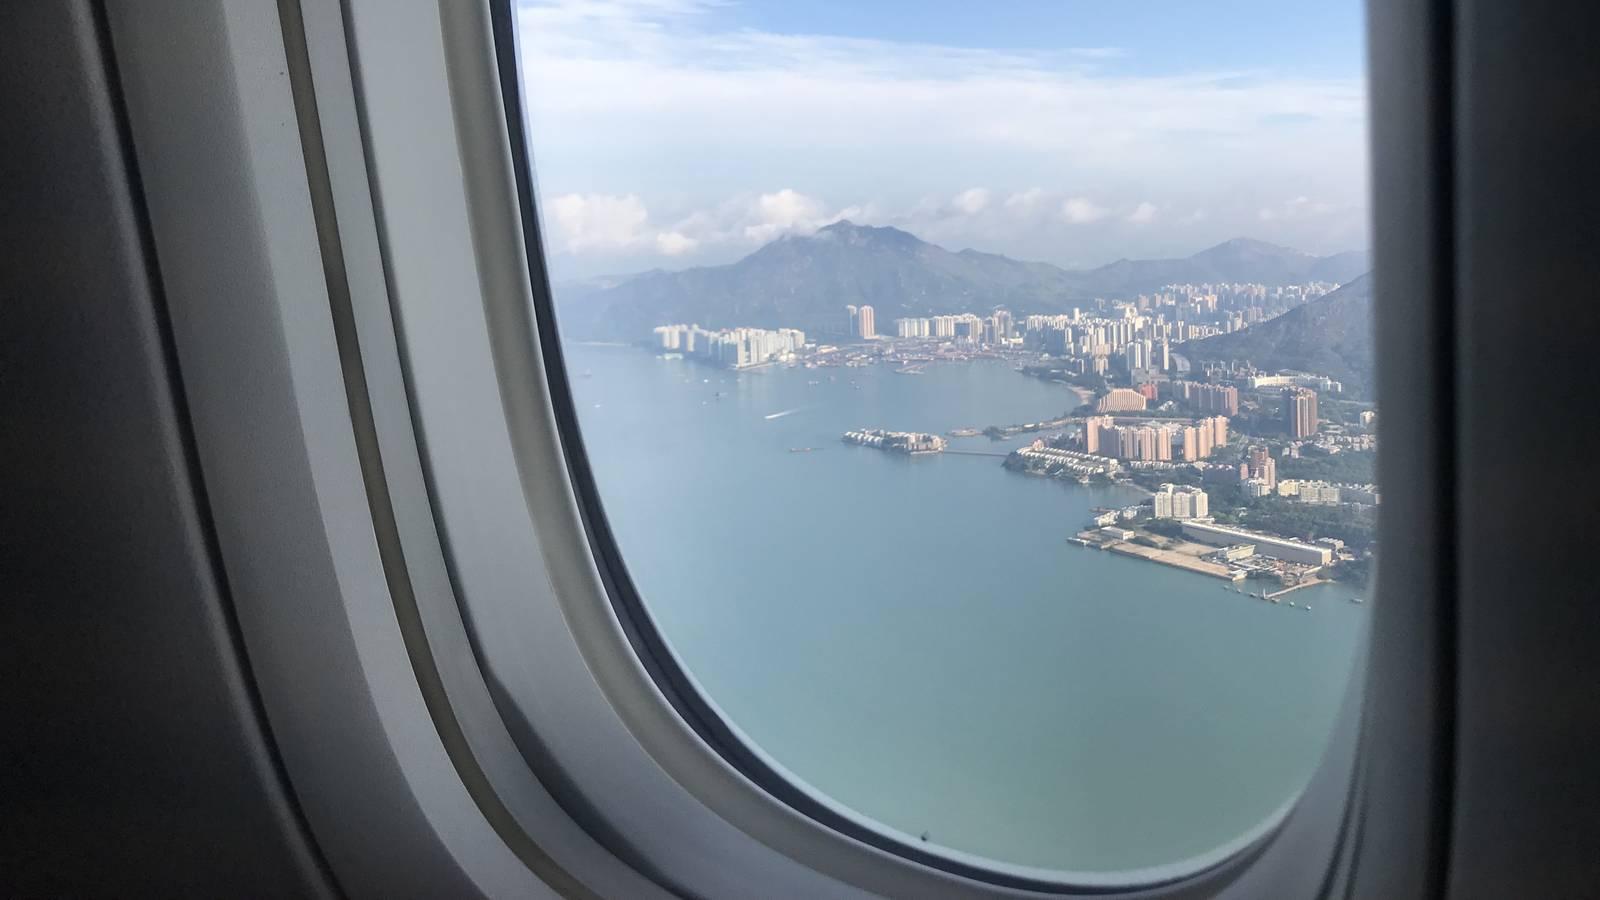 Der Anflug auf Hong Kong ist immer noch spektakulär (© Radio Argovia)